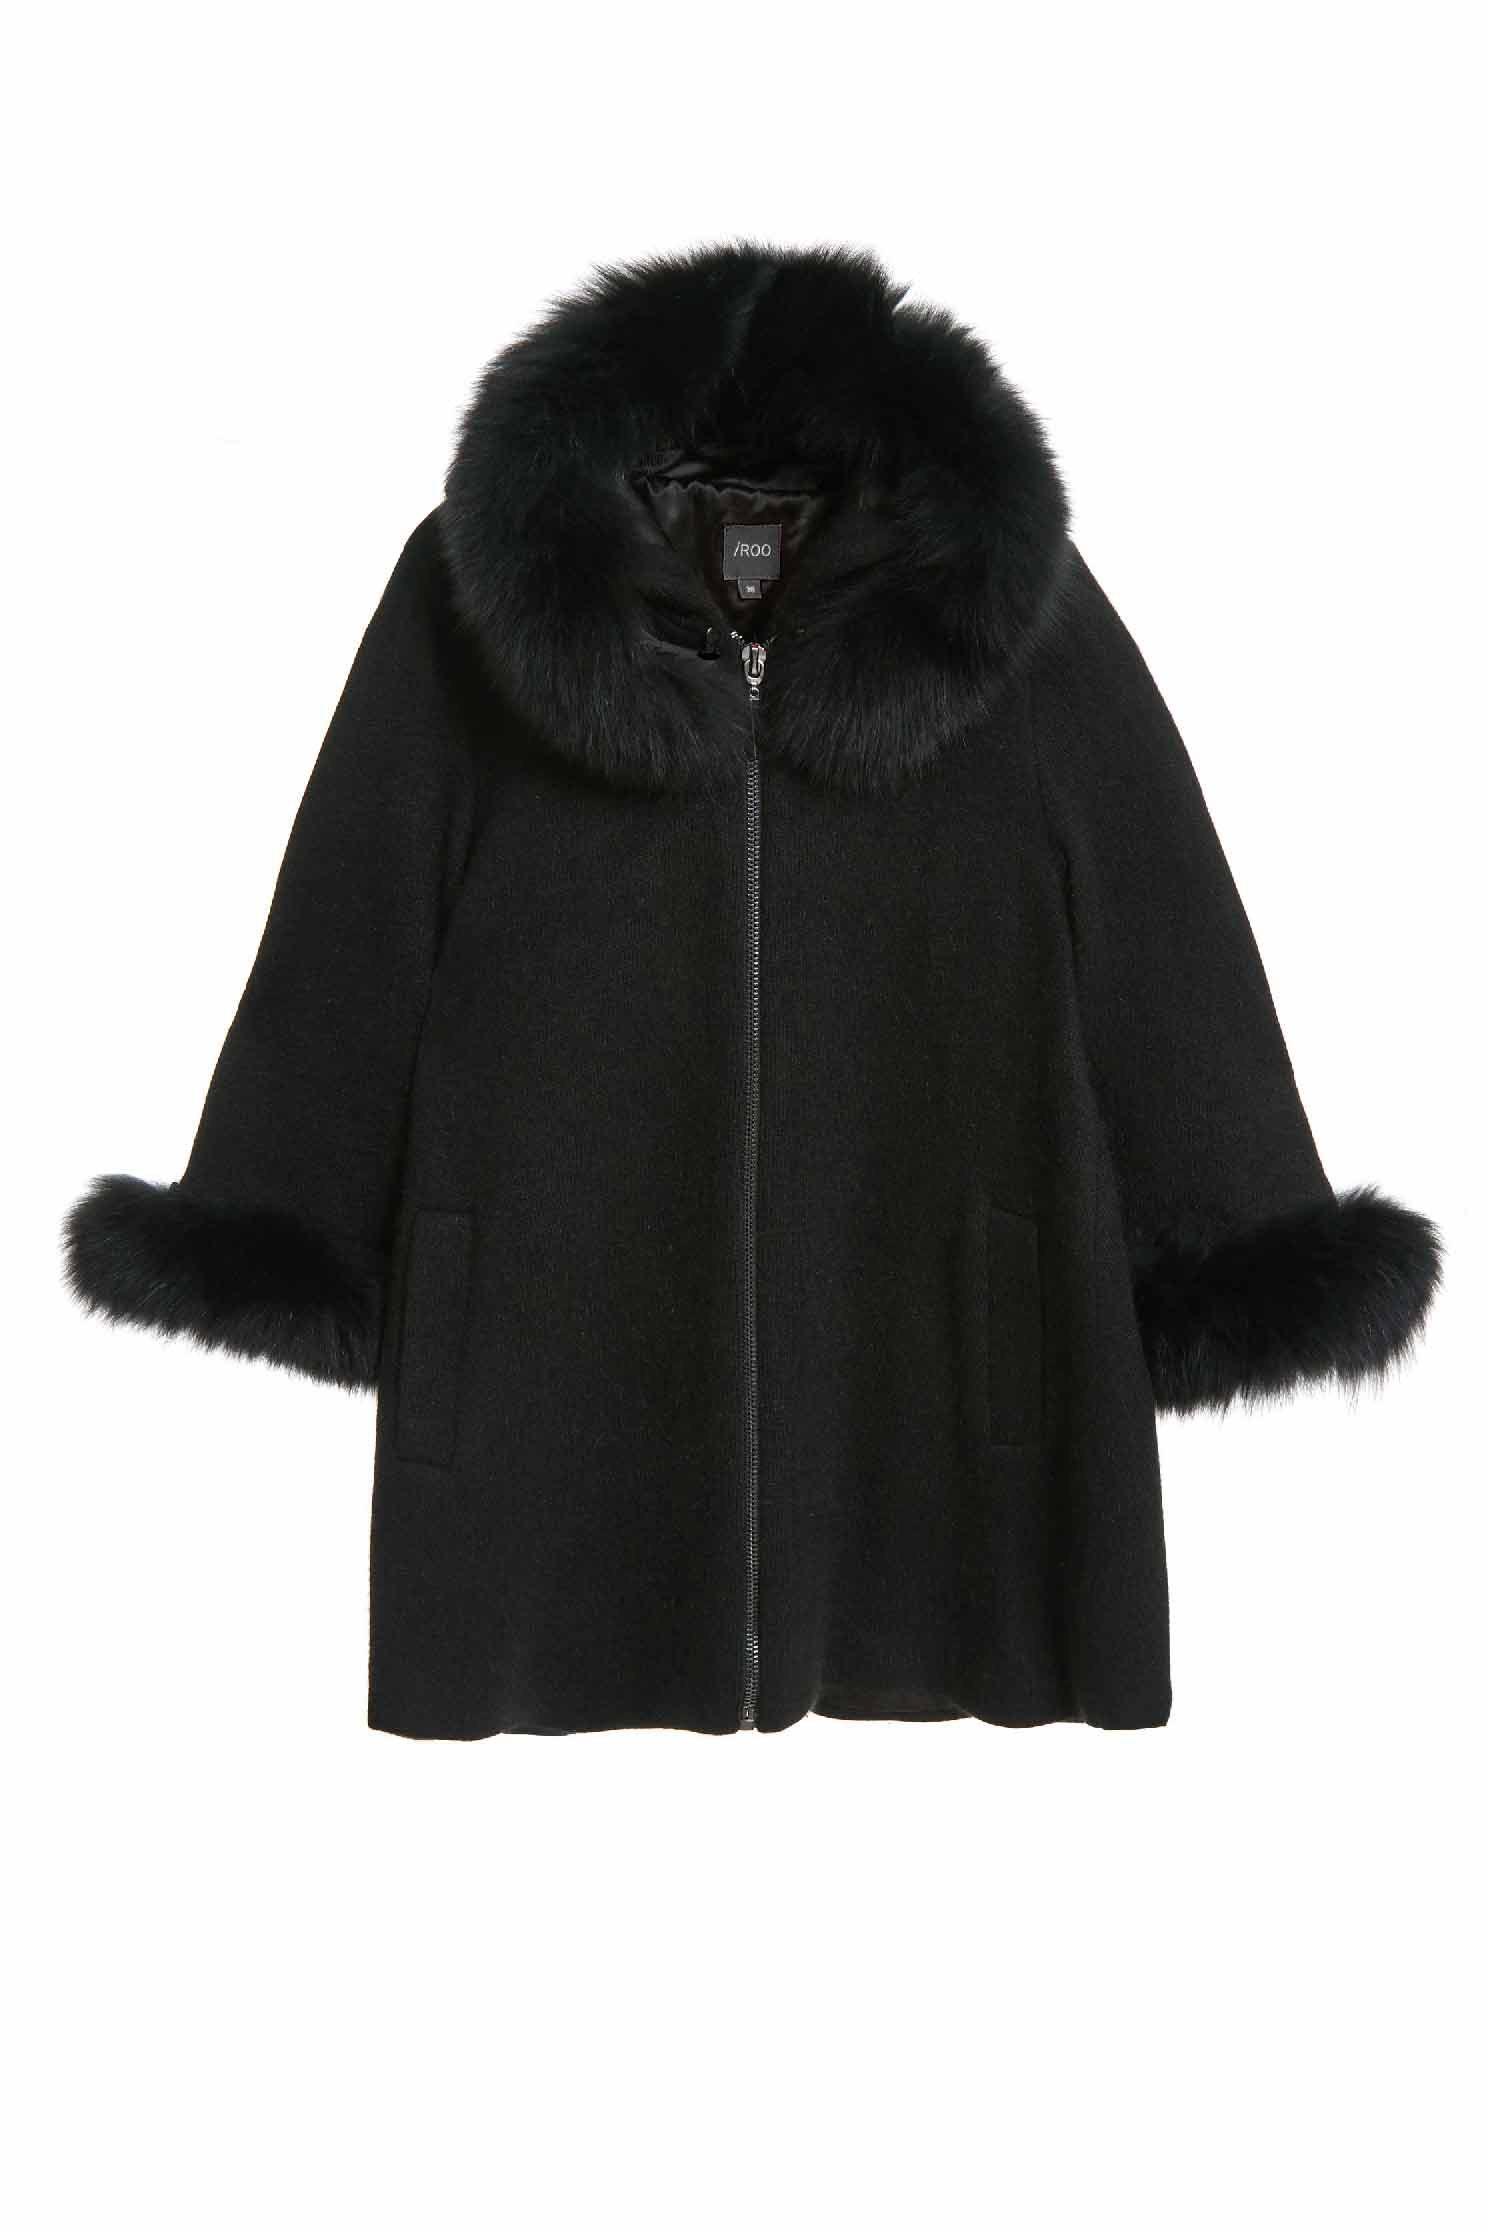 Rabbit velvet knitted jacket,coldforwinter,outerwear,newyearred,cardigan,hoodiejacket,knitting,knittedjacket,longsleeveouterwear,blackouterwear